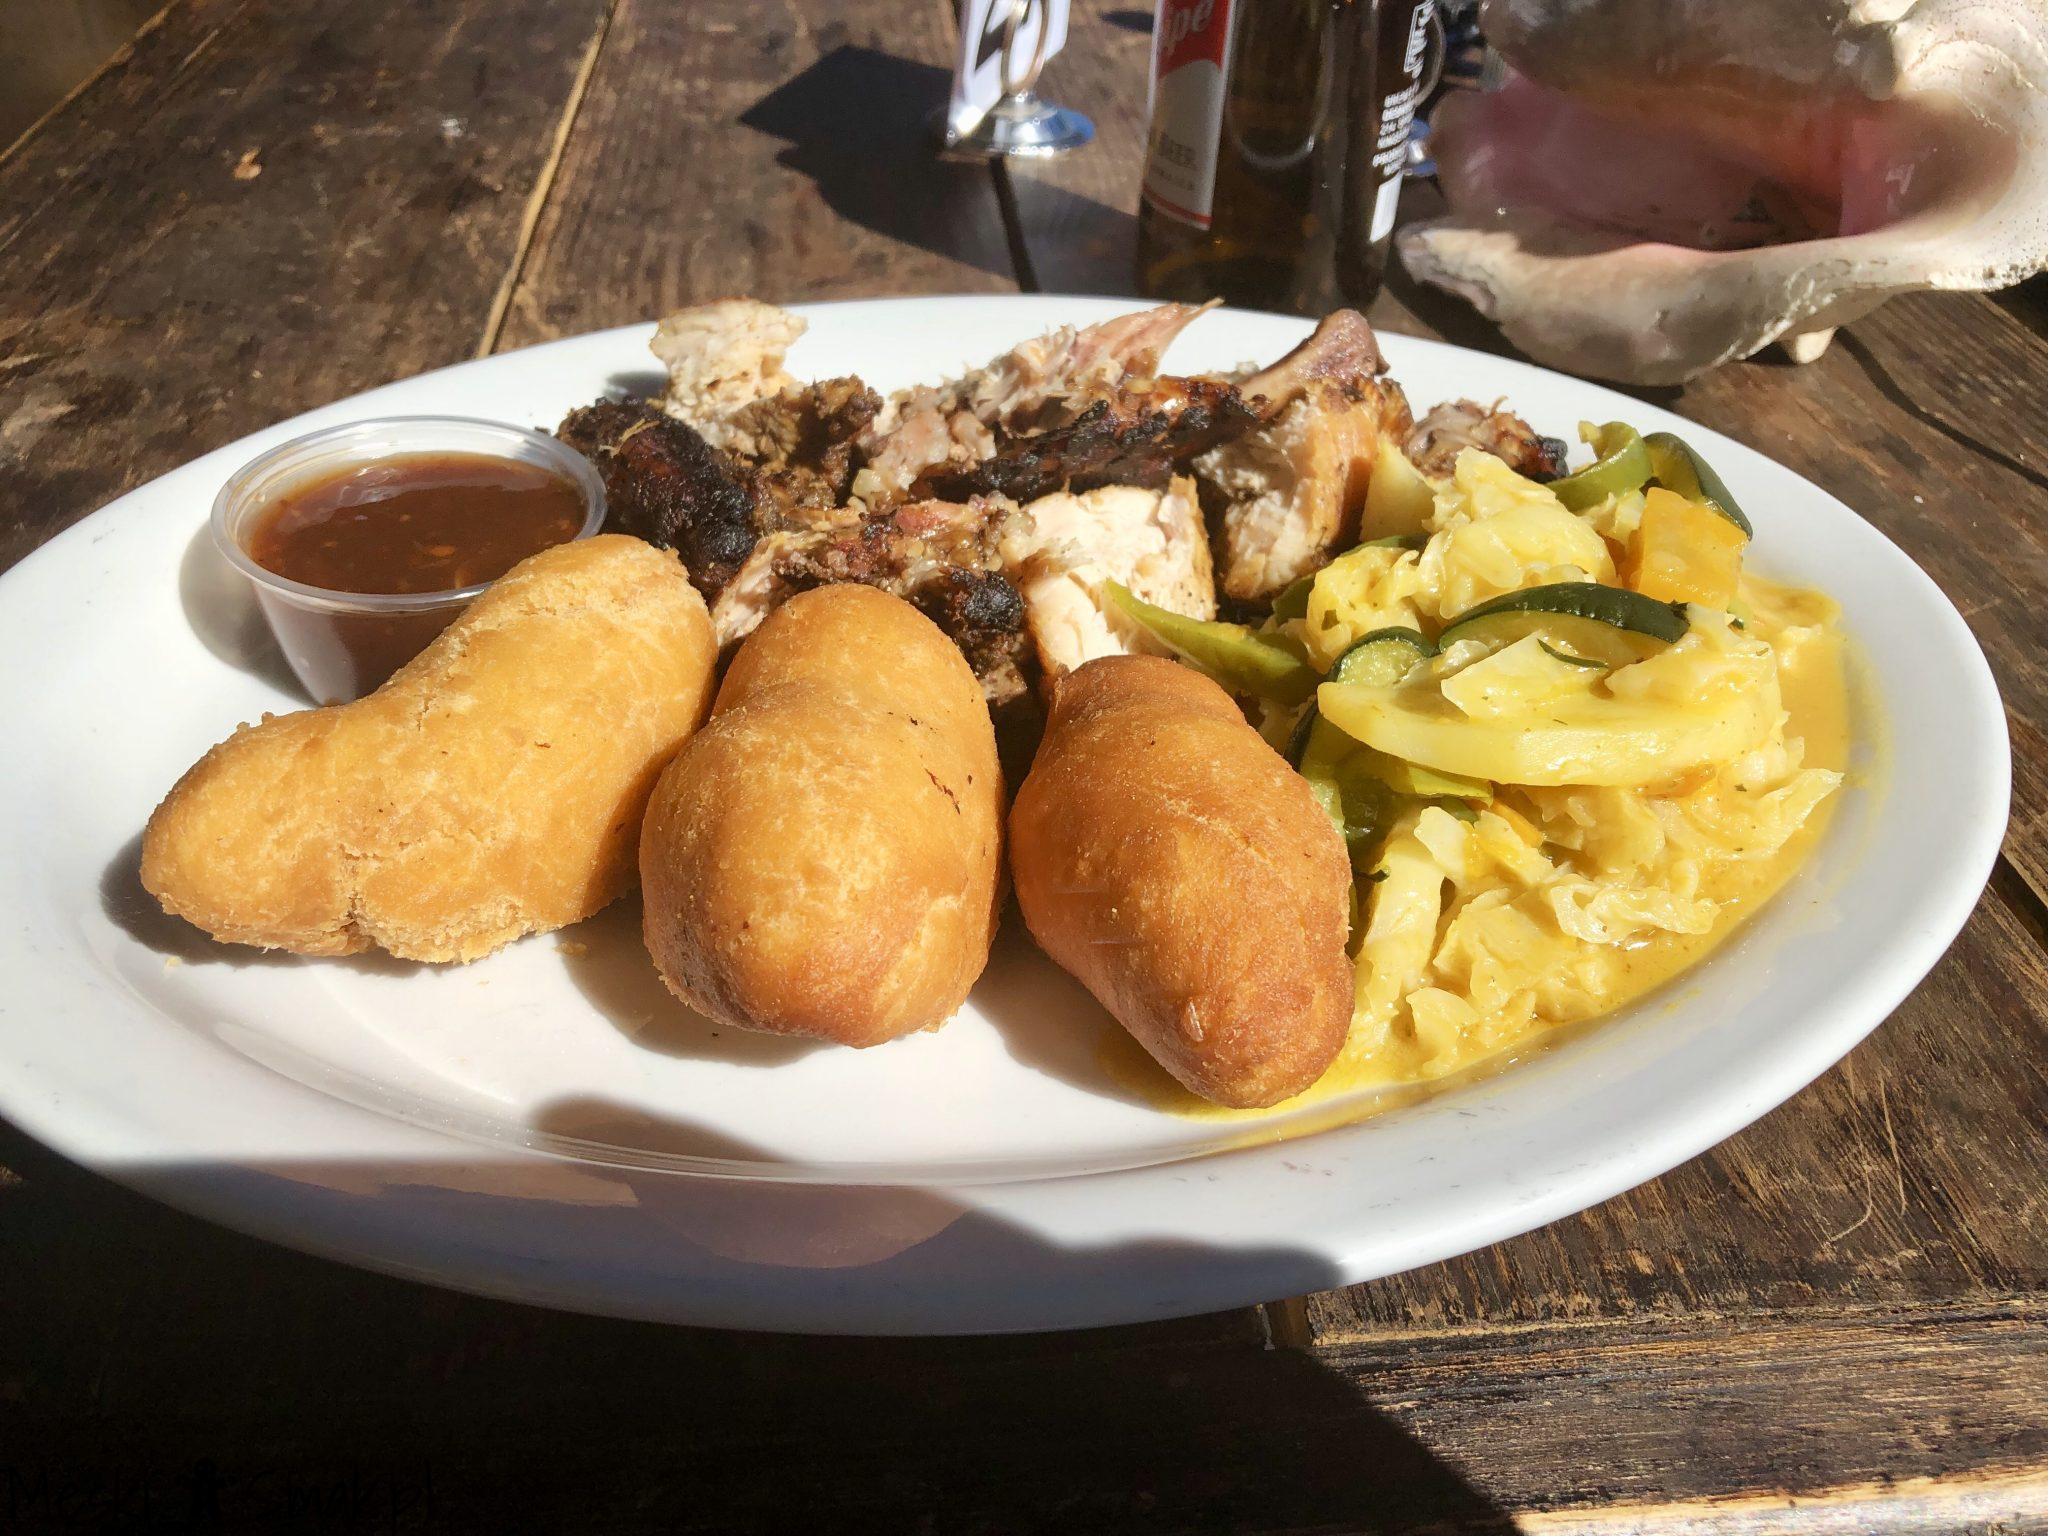 Jamaican Jerk Chicken and Festival Fry Dumplings